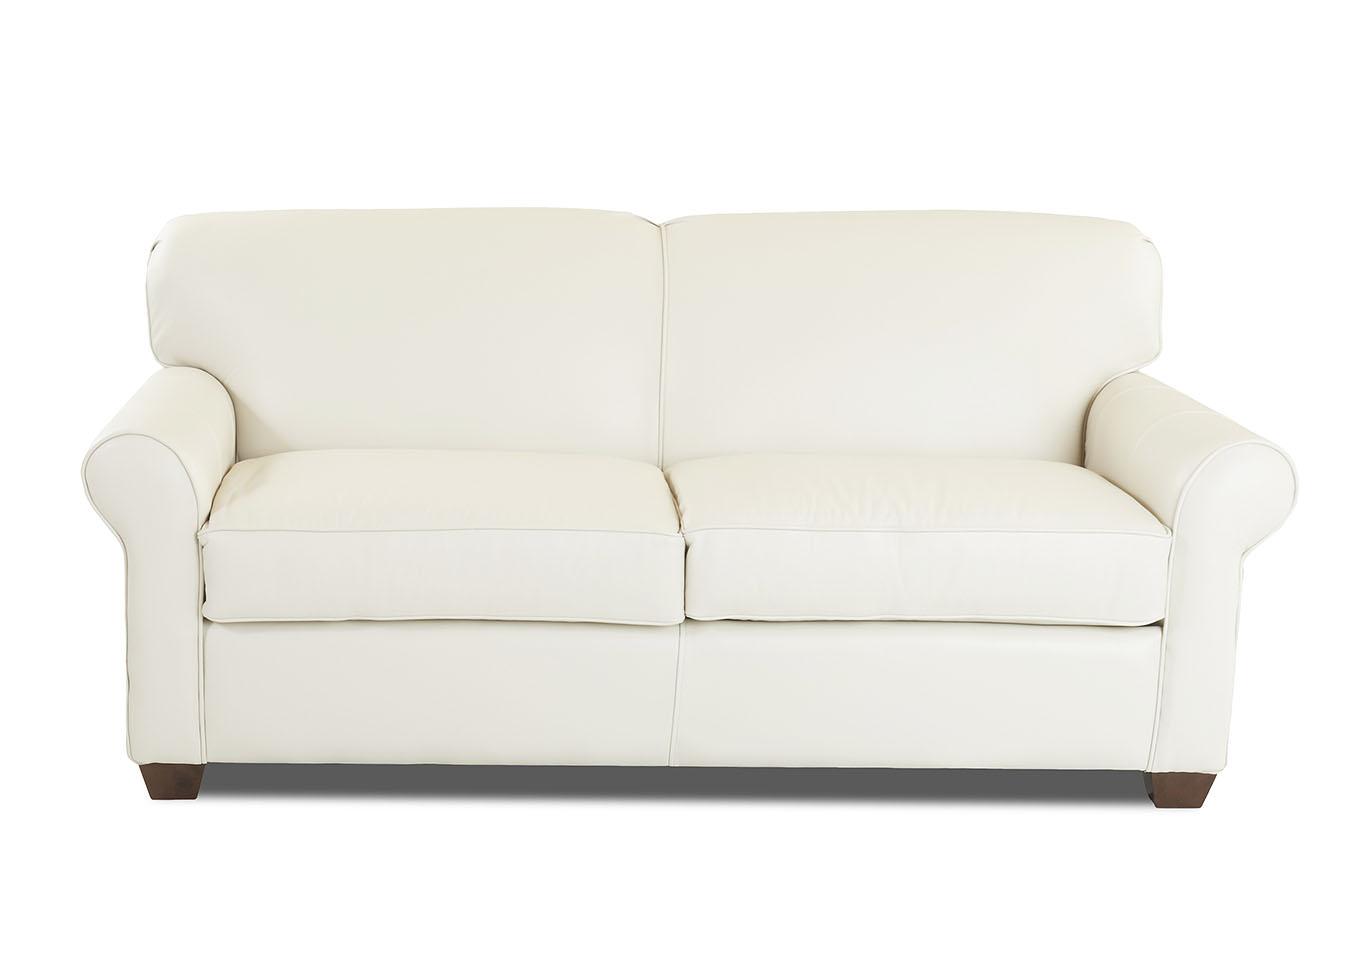 Orbit Furniture NY Mayhew White Leather Sleeper Sofa